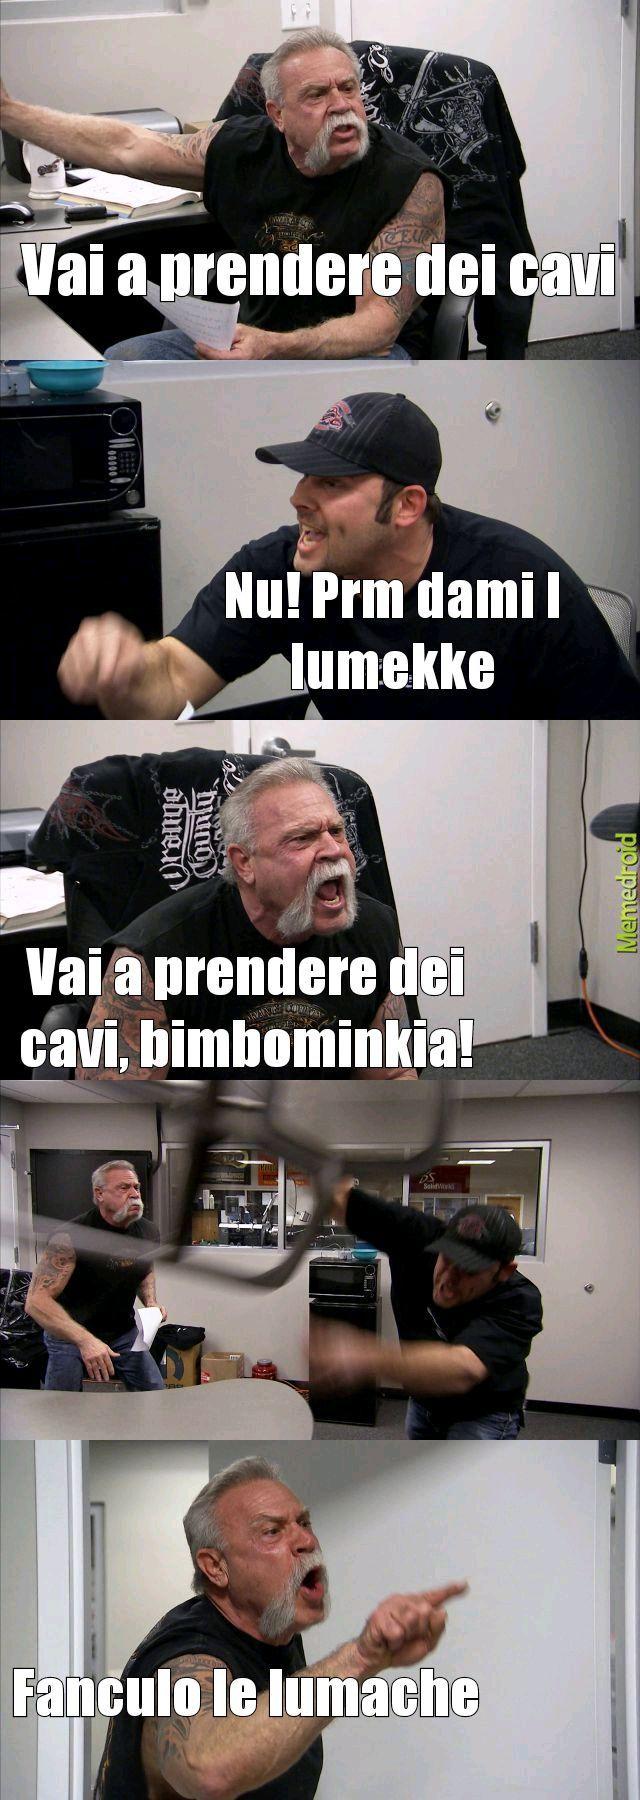 Cavi - meme